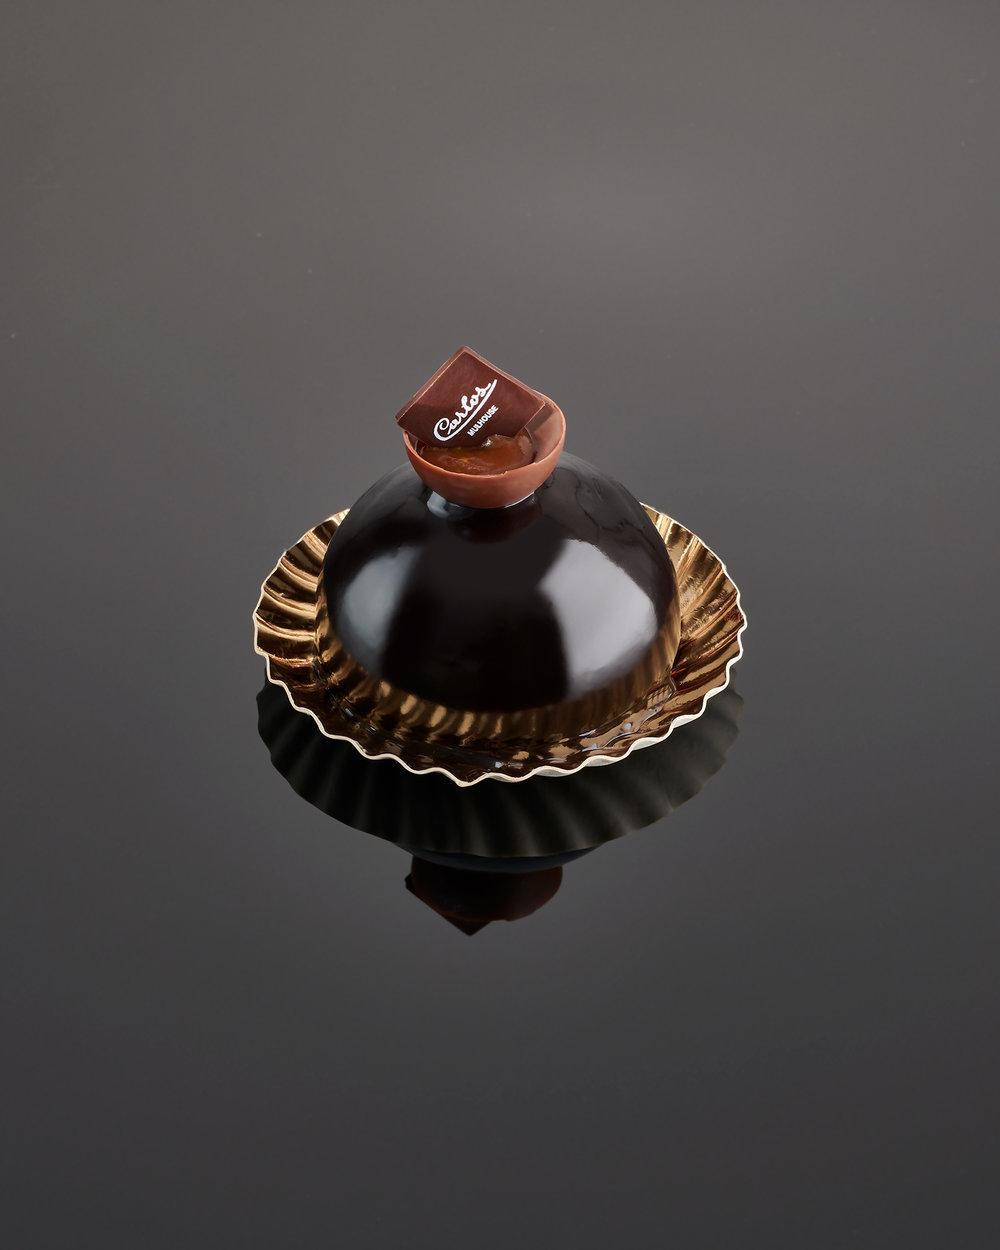 Carlos-Chocolat0694.jpg